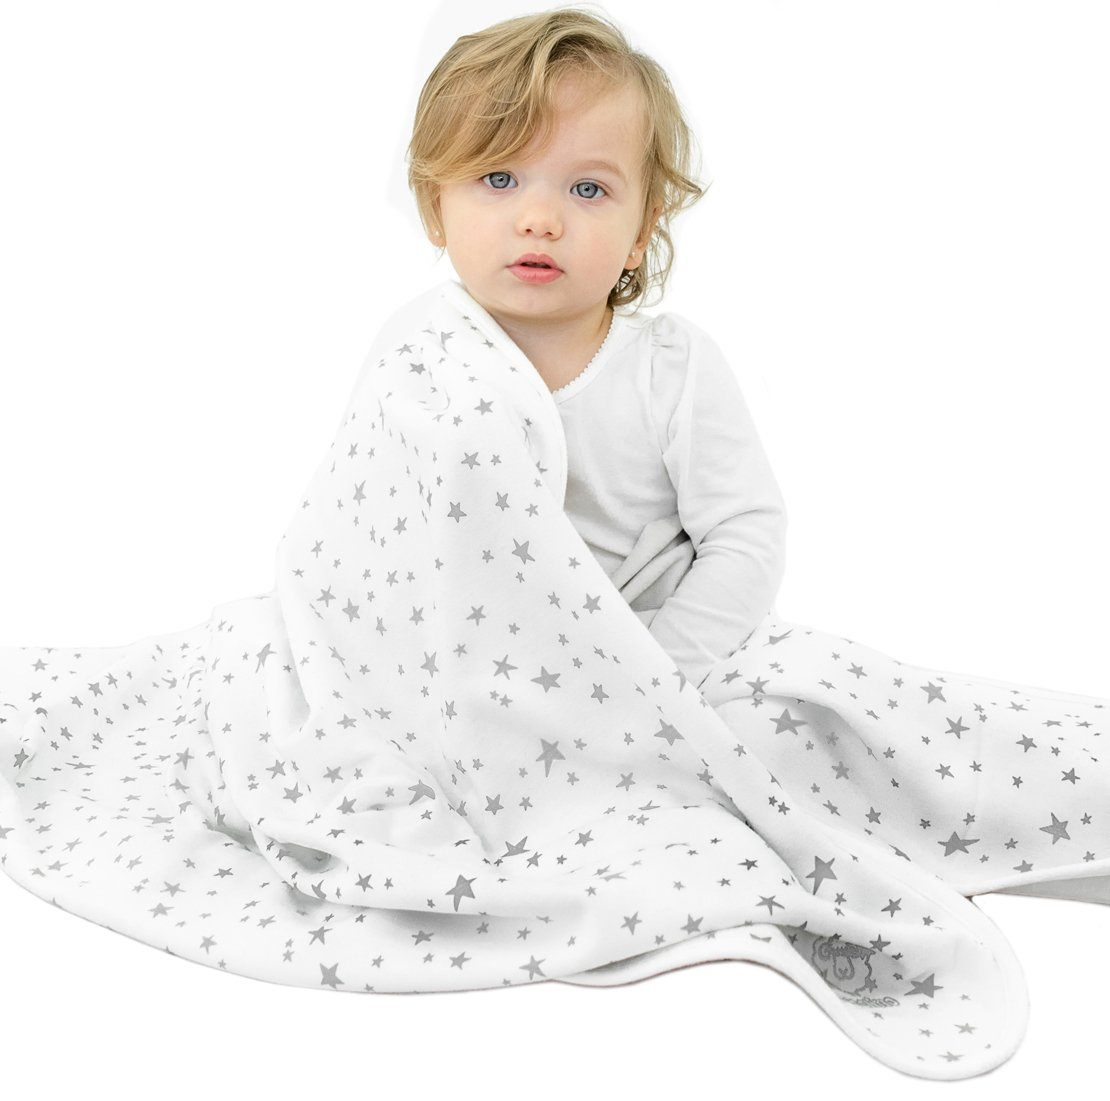 "Baby Blanket from Woolino, 4 Season Stroller Merino Wool Blanket, Silky Soft & Machine Washable, 40"" x 31.5"", Stars 40"" x 31.5"" SBL001"